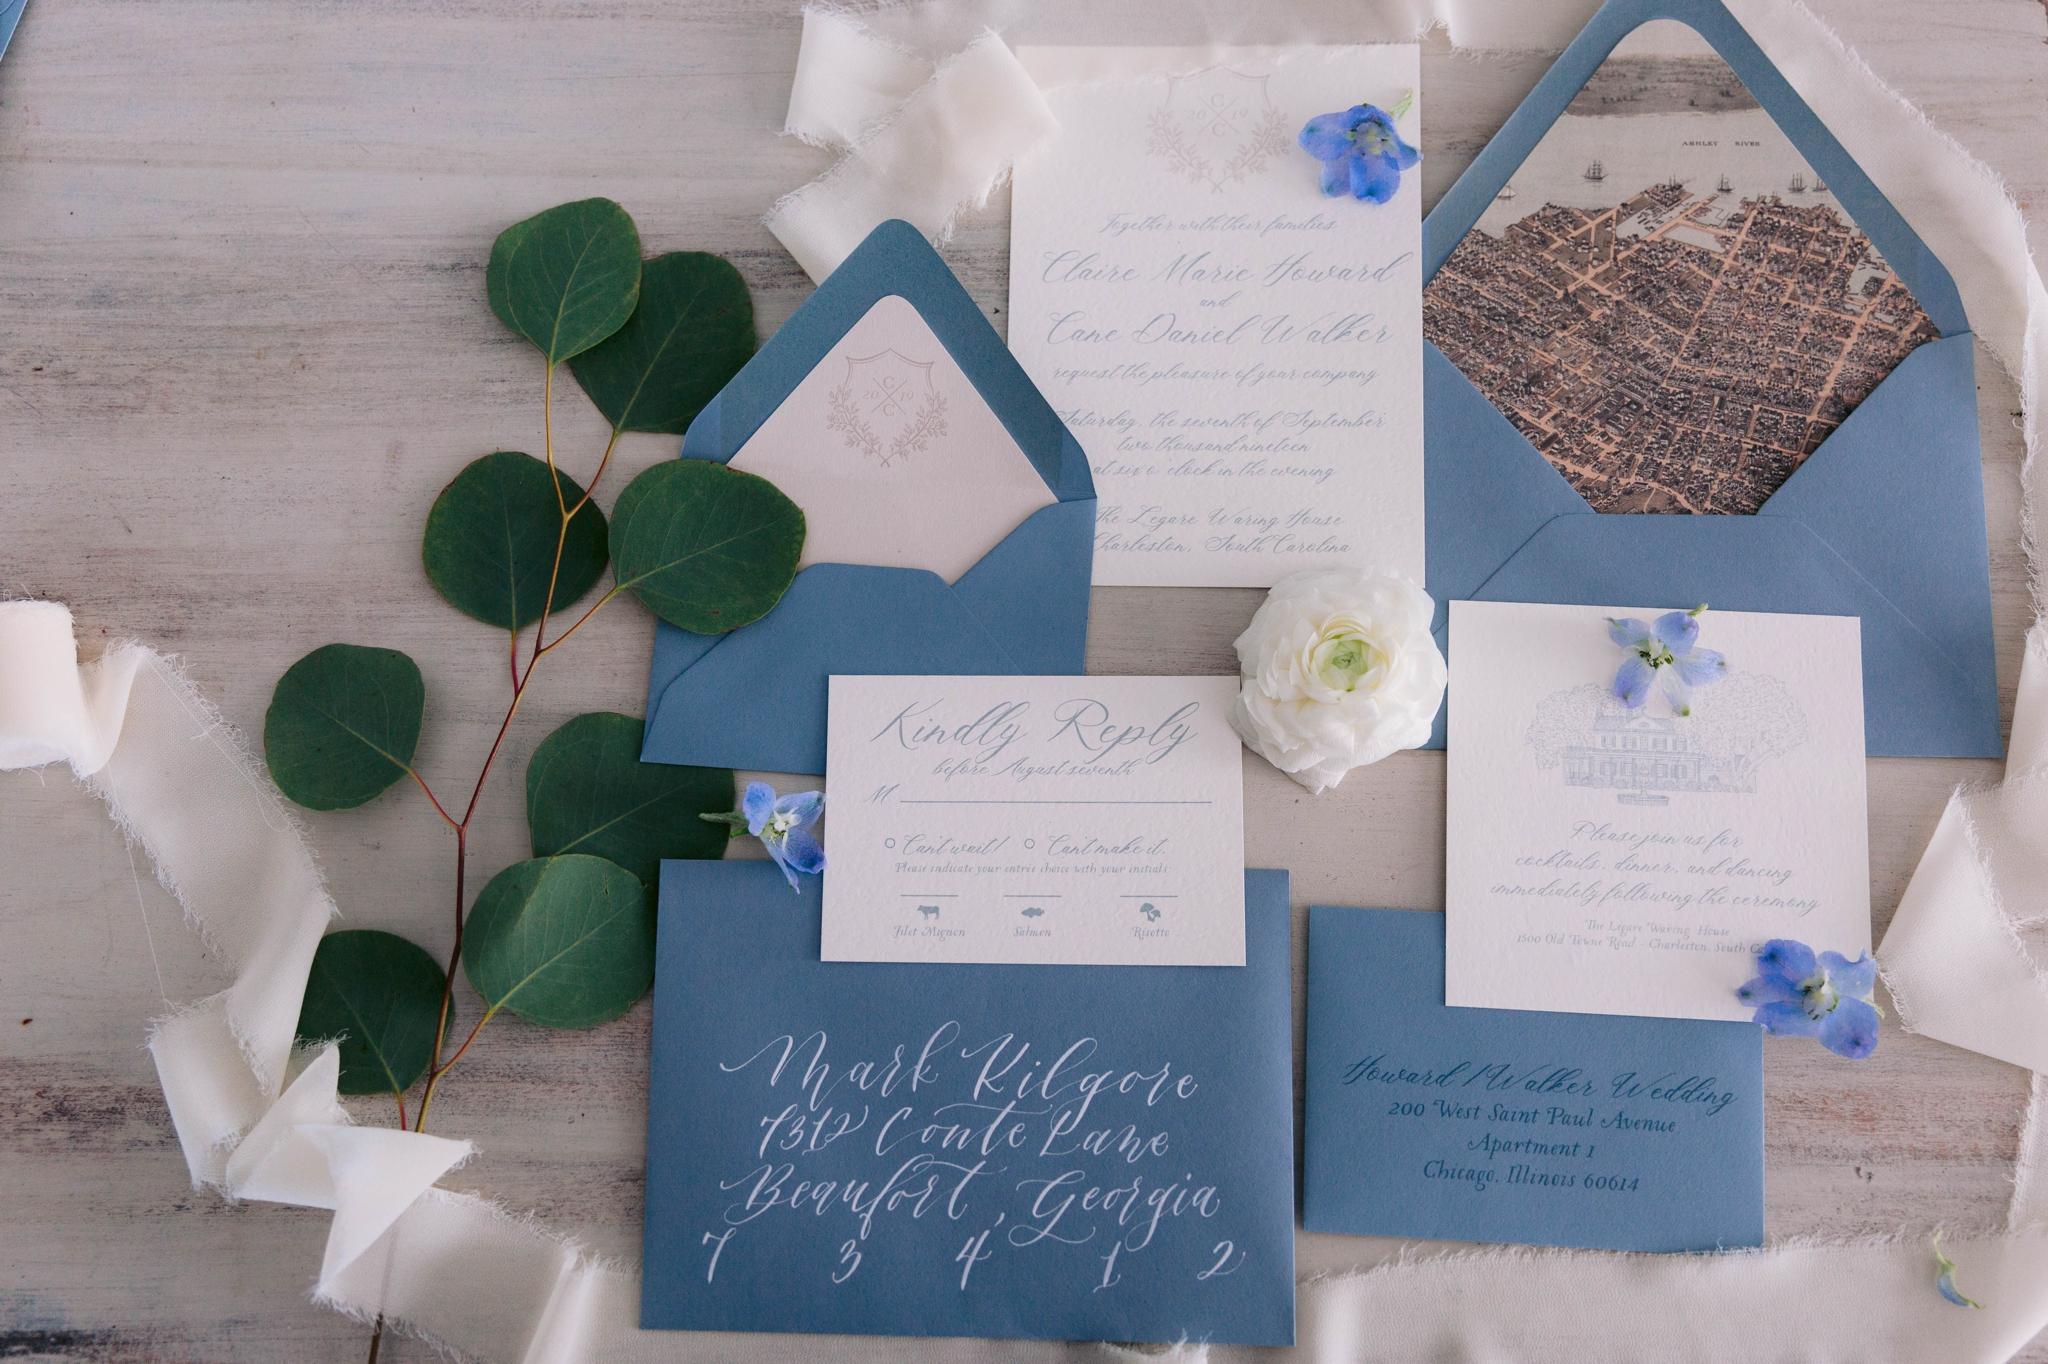 dusty blue wedding invitation suite - martha stewart weddings - style me pretty - Dusty Blue Wedding Inspiration - fine art photography - Honolulu, Oahu, Hawaii Wedding Photographer - johanna dye